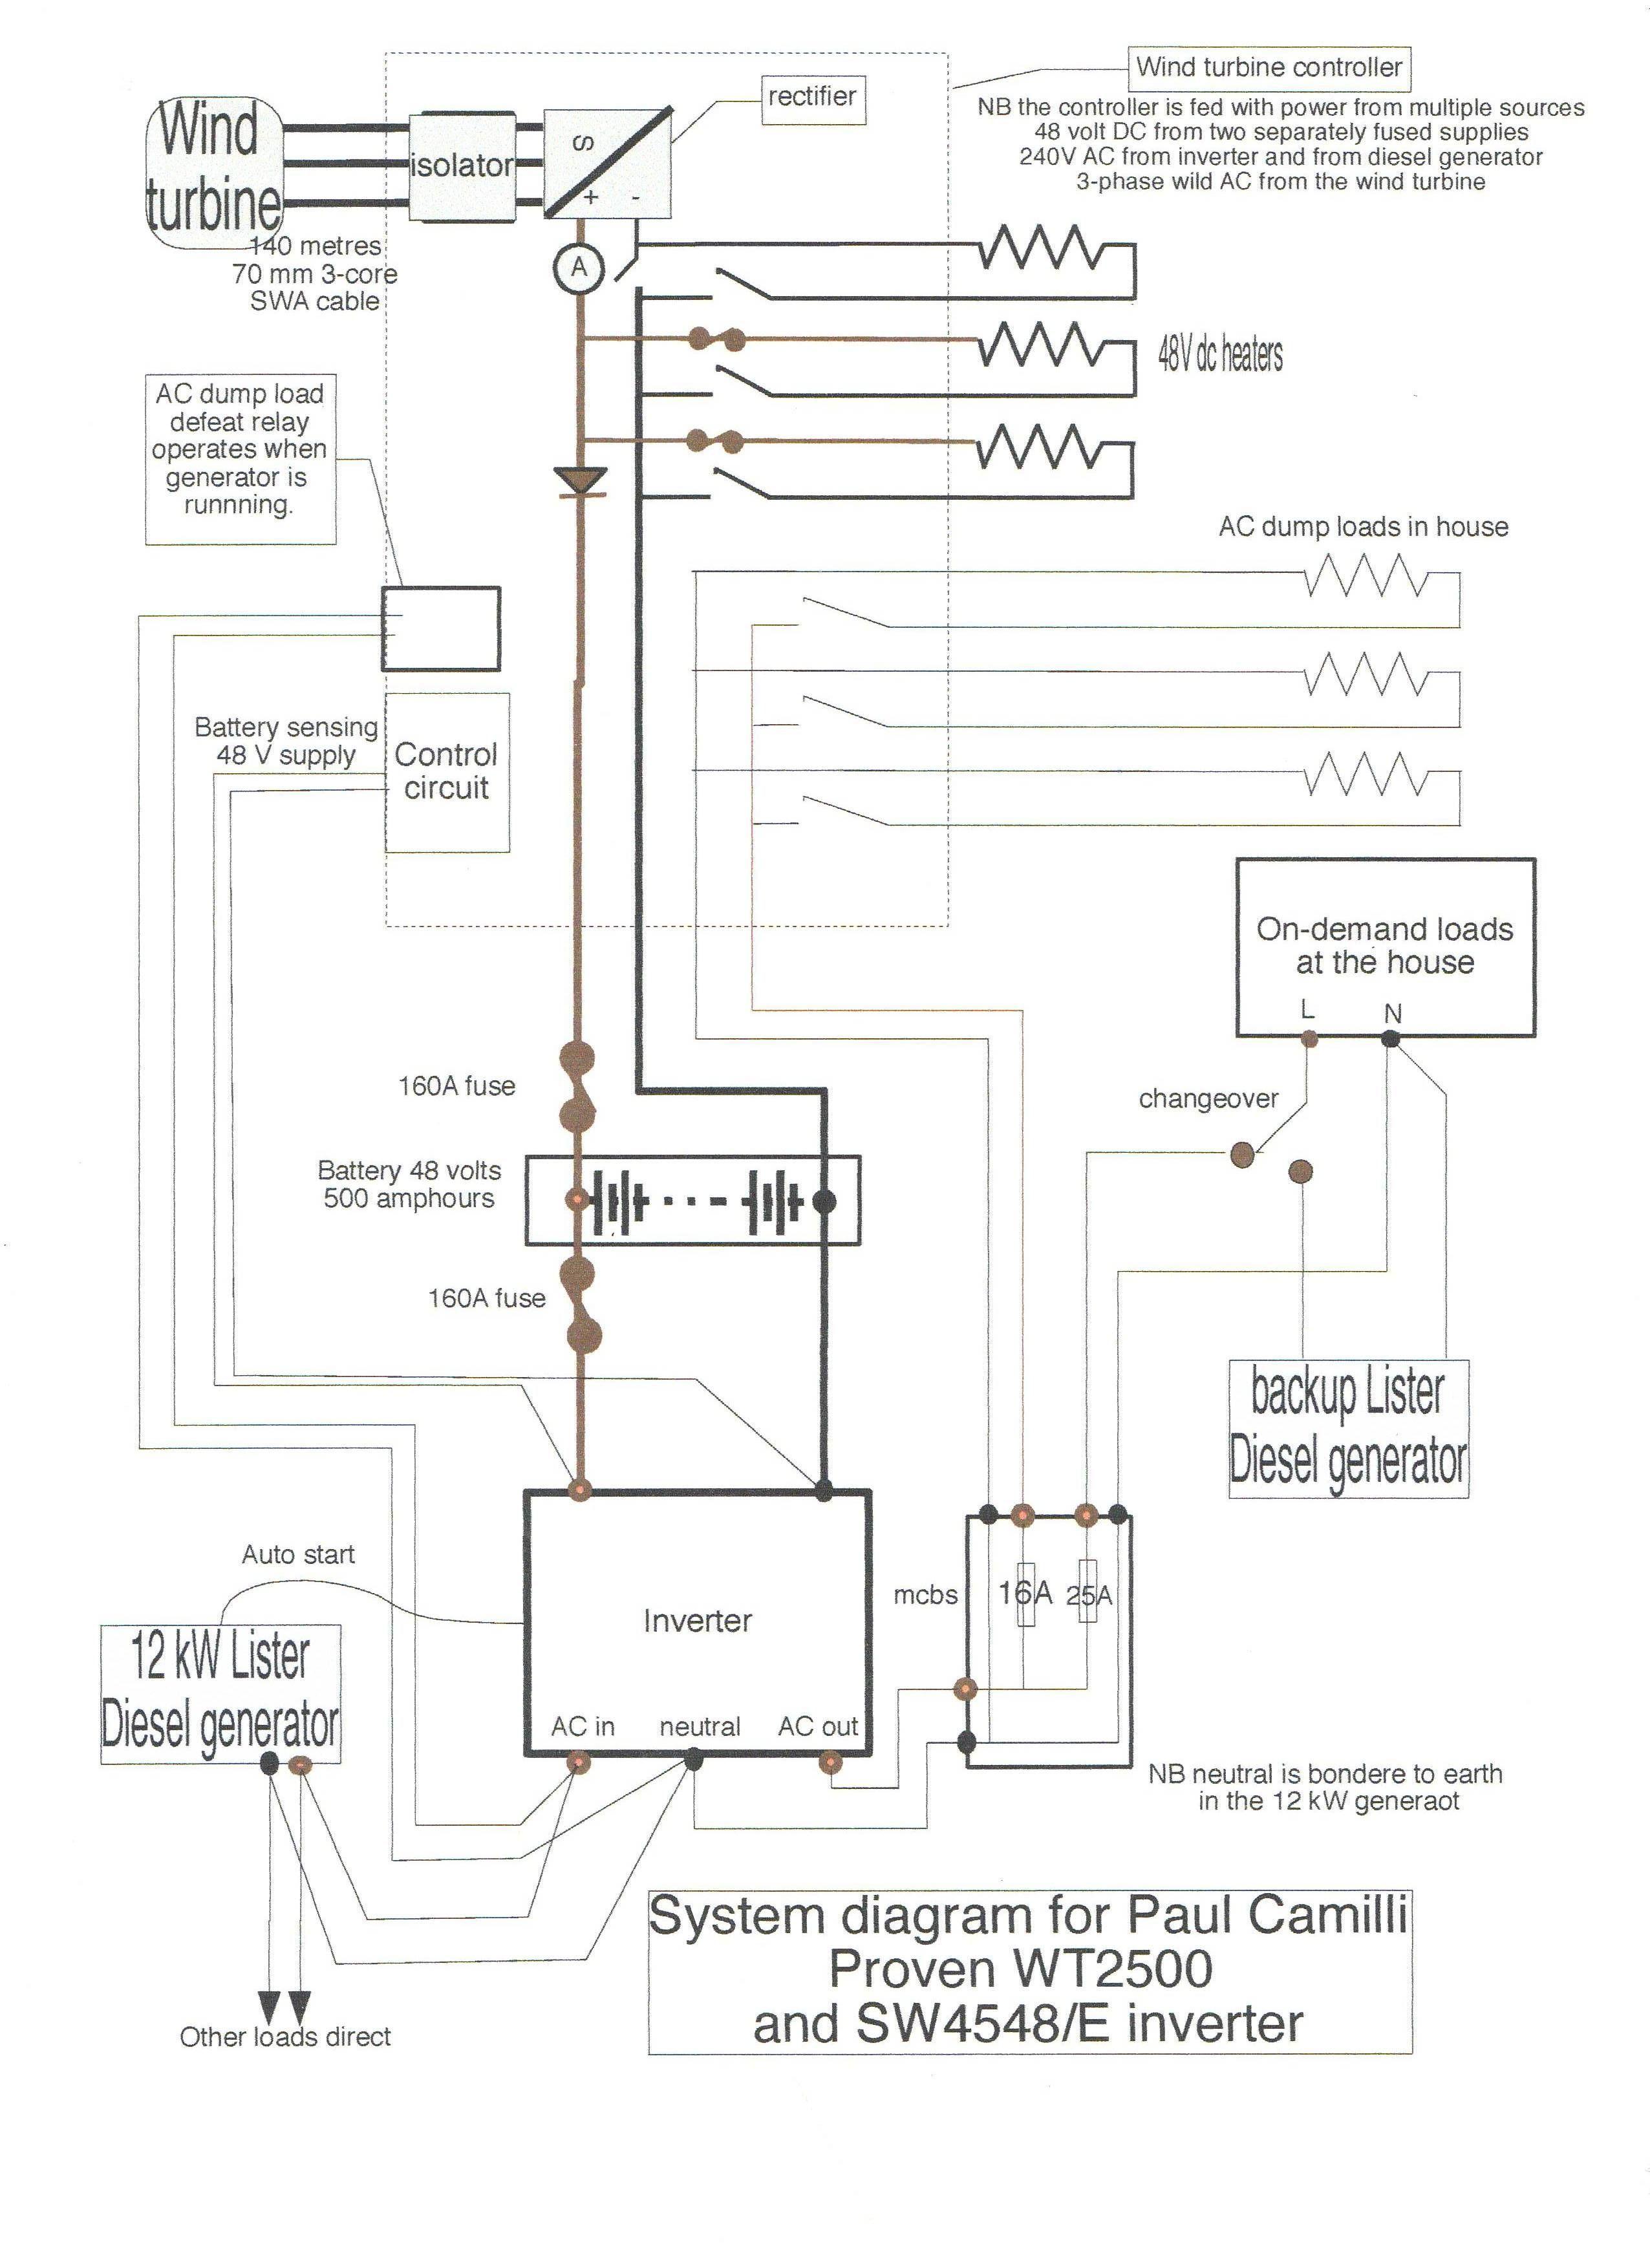 Wind Turbine Wiring Diagram | Homesteading | Wind Turbine, Diagram, Wire - Wind Turbine Wiring Diagram